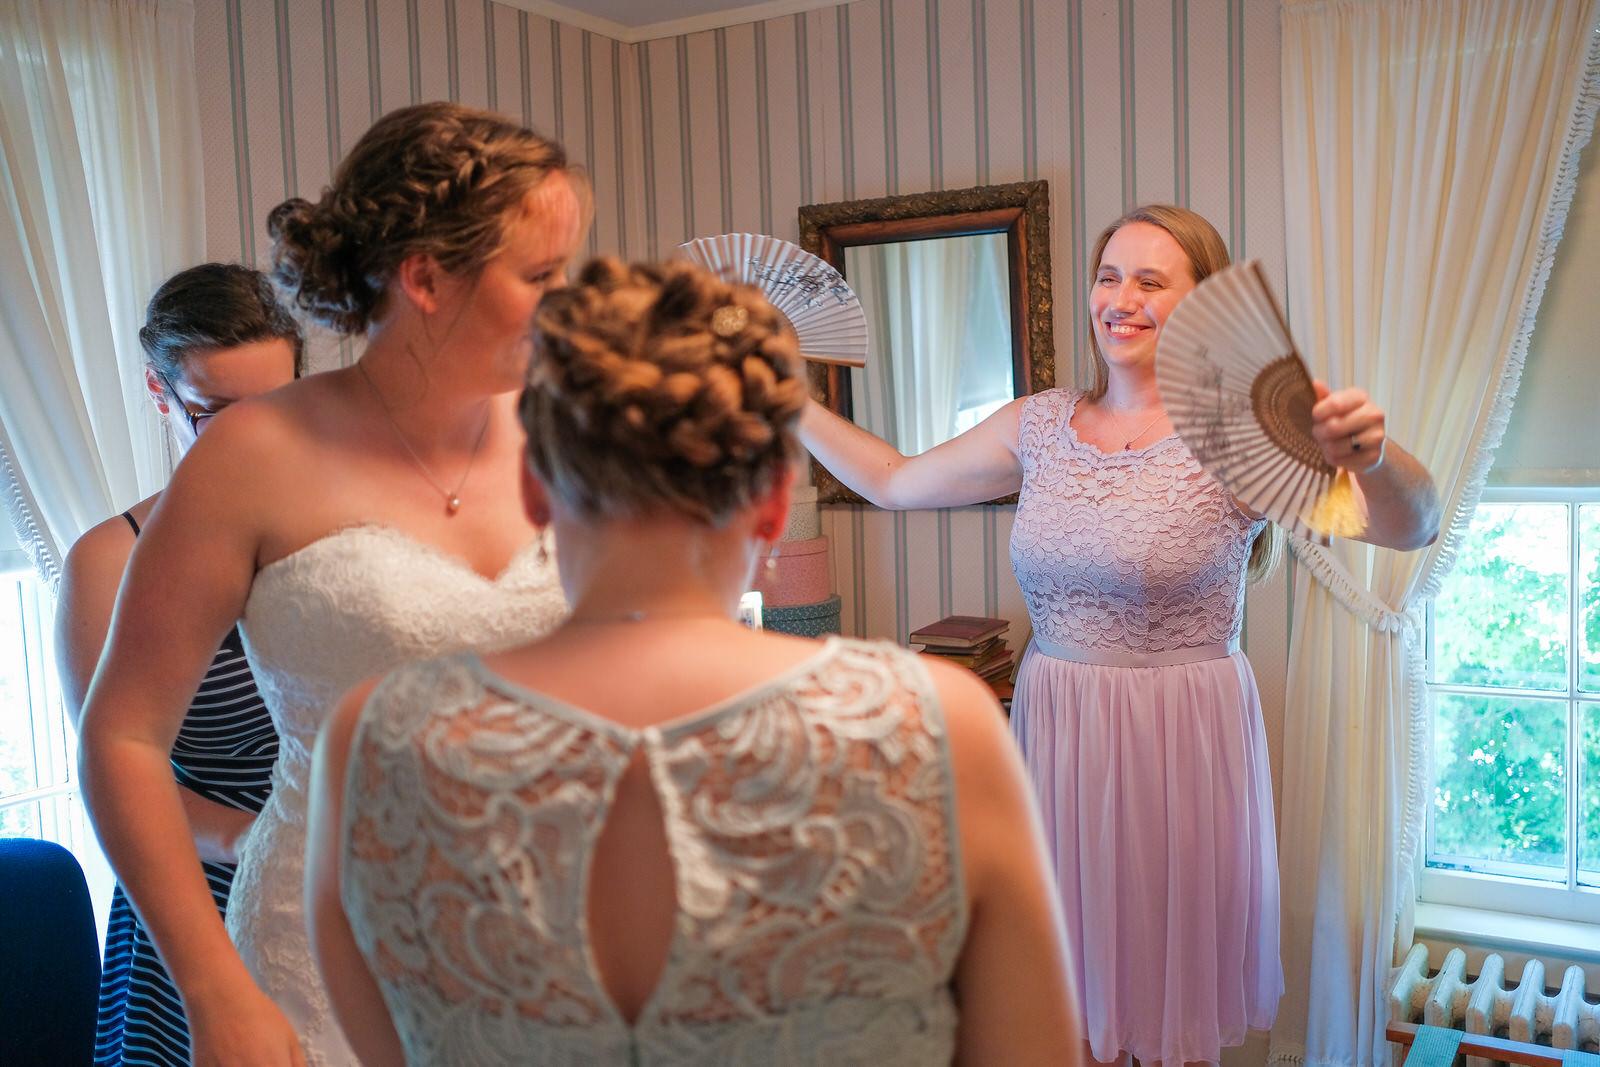 candid-vermont-wedding-photography-237.jpg